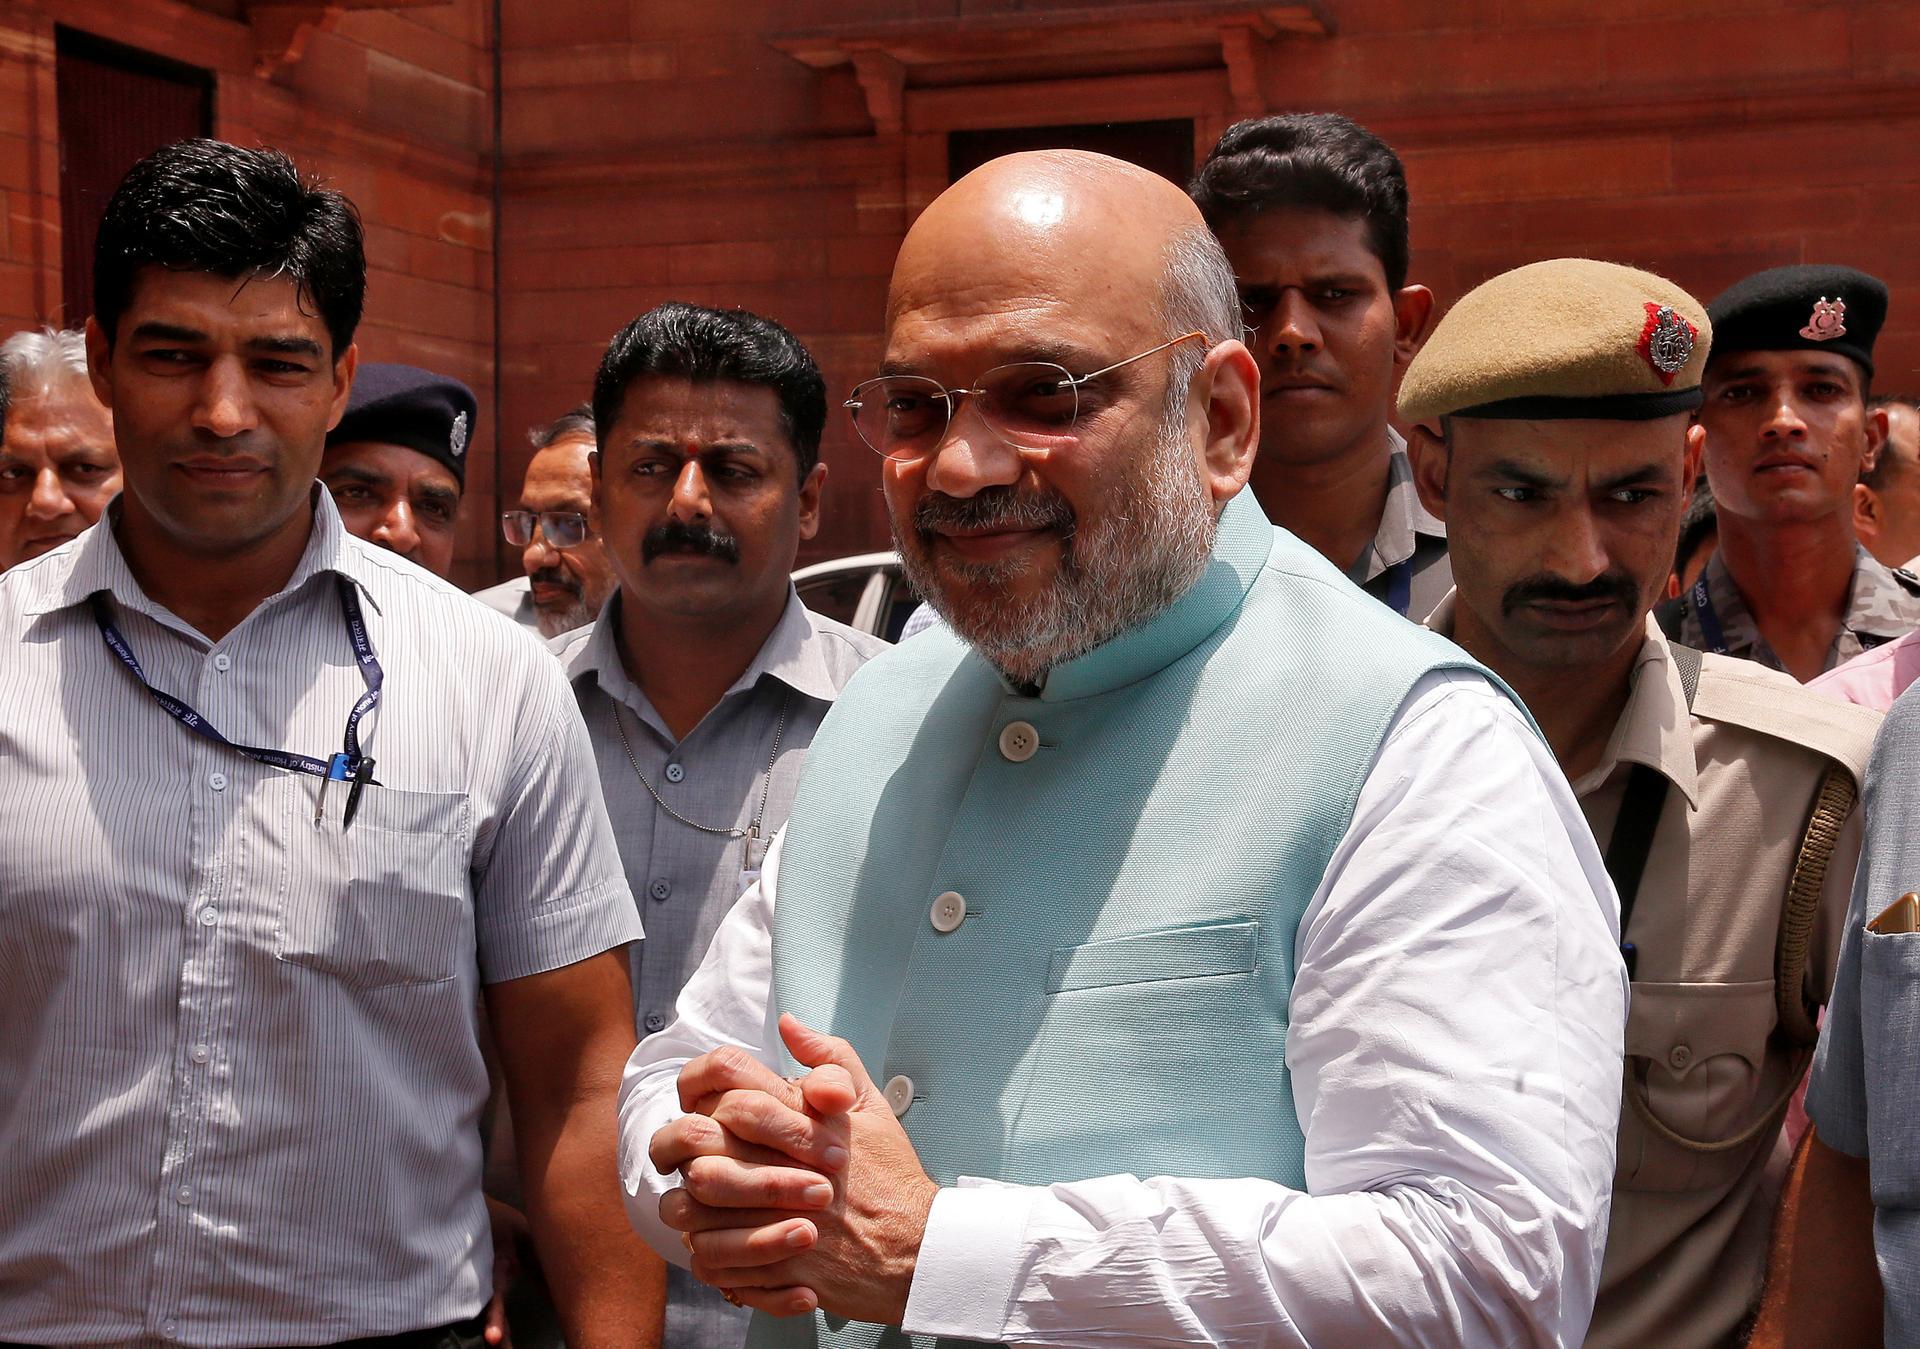 India's interior minister hospitalised with coronavirus